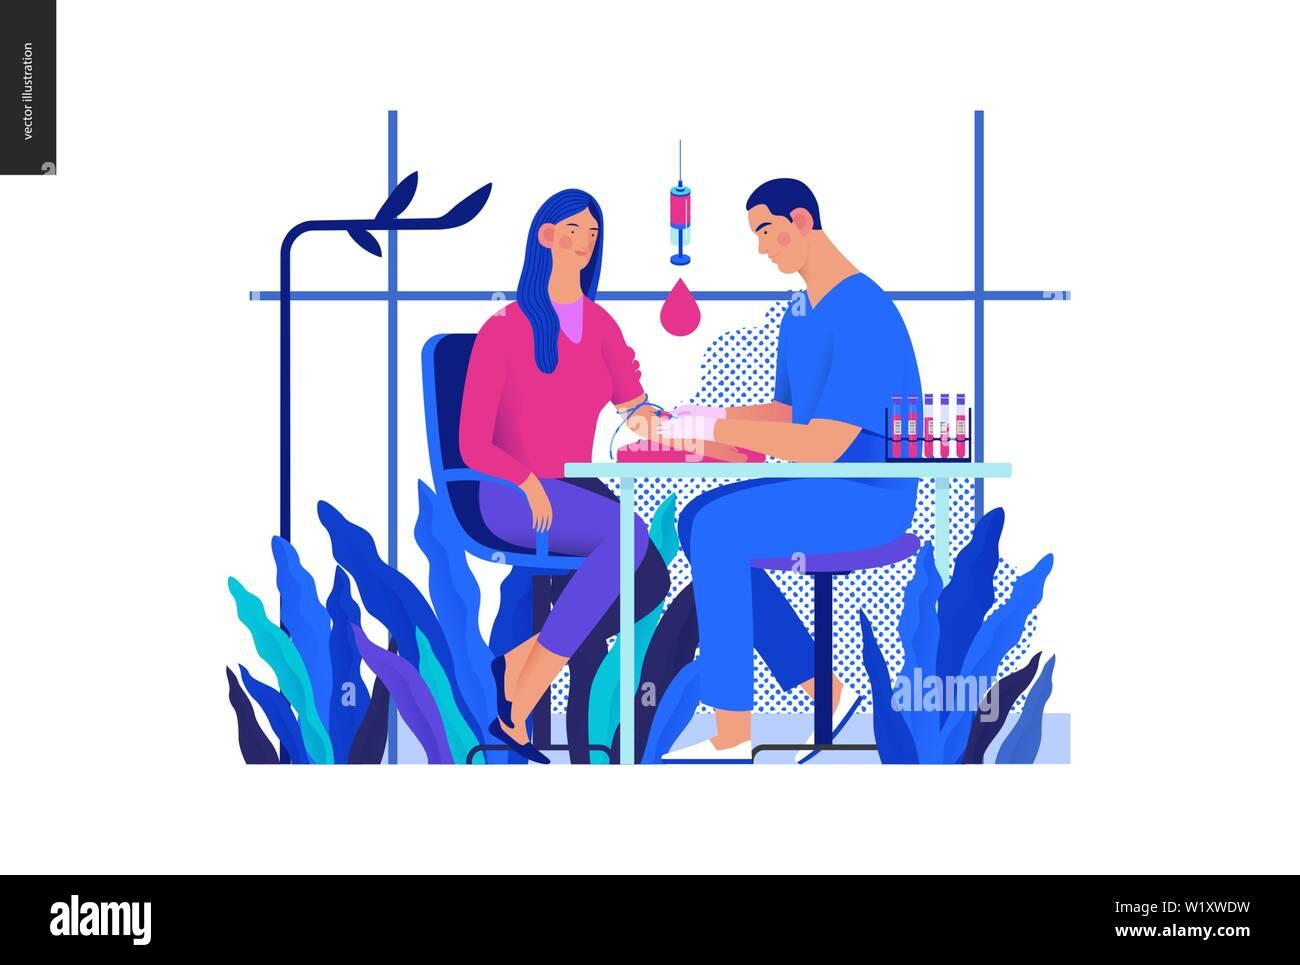 Medical tests Blue illustration - blood test - modern flat vector concept digital illustration of blood test procedure - patient and doctor with syrin Stock Vector